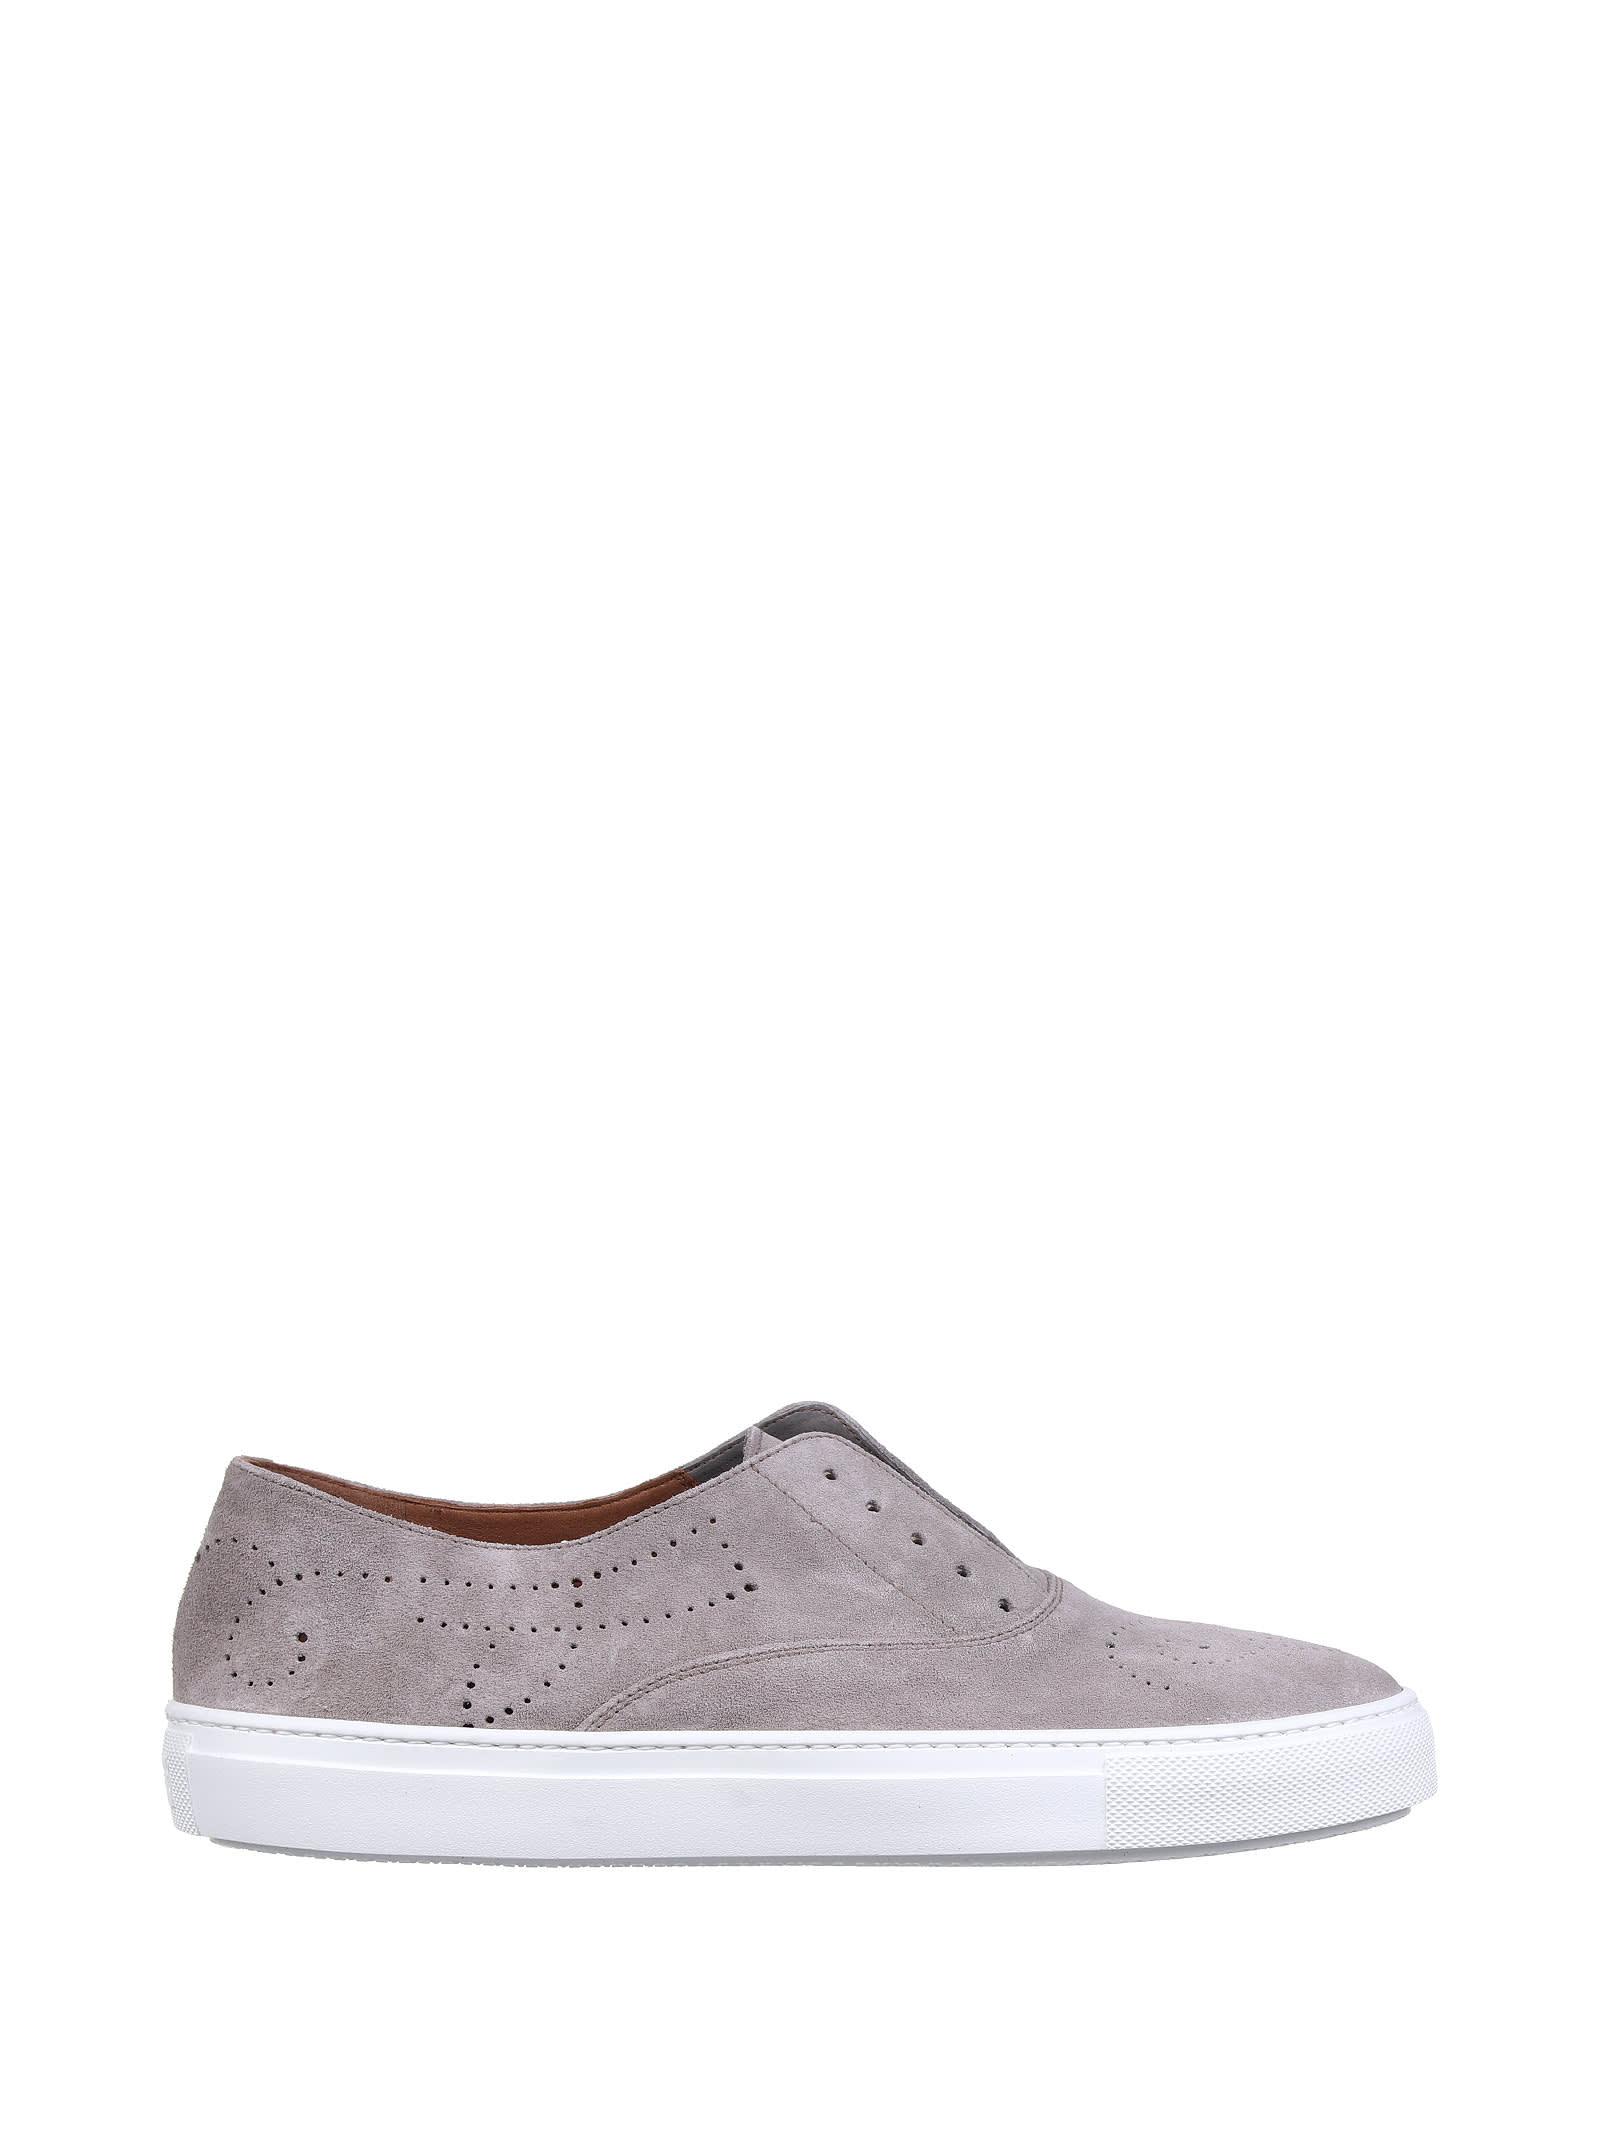 Fratelli Rossetti Grey Sneakers